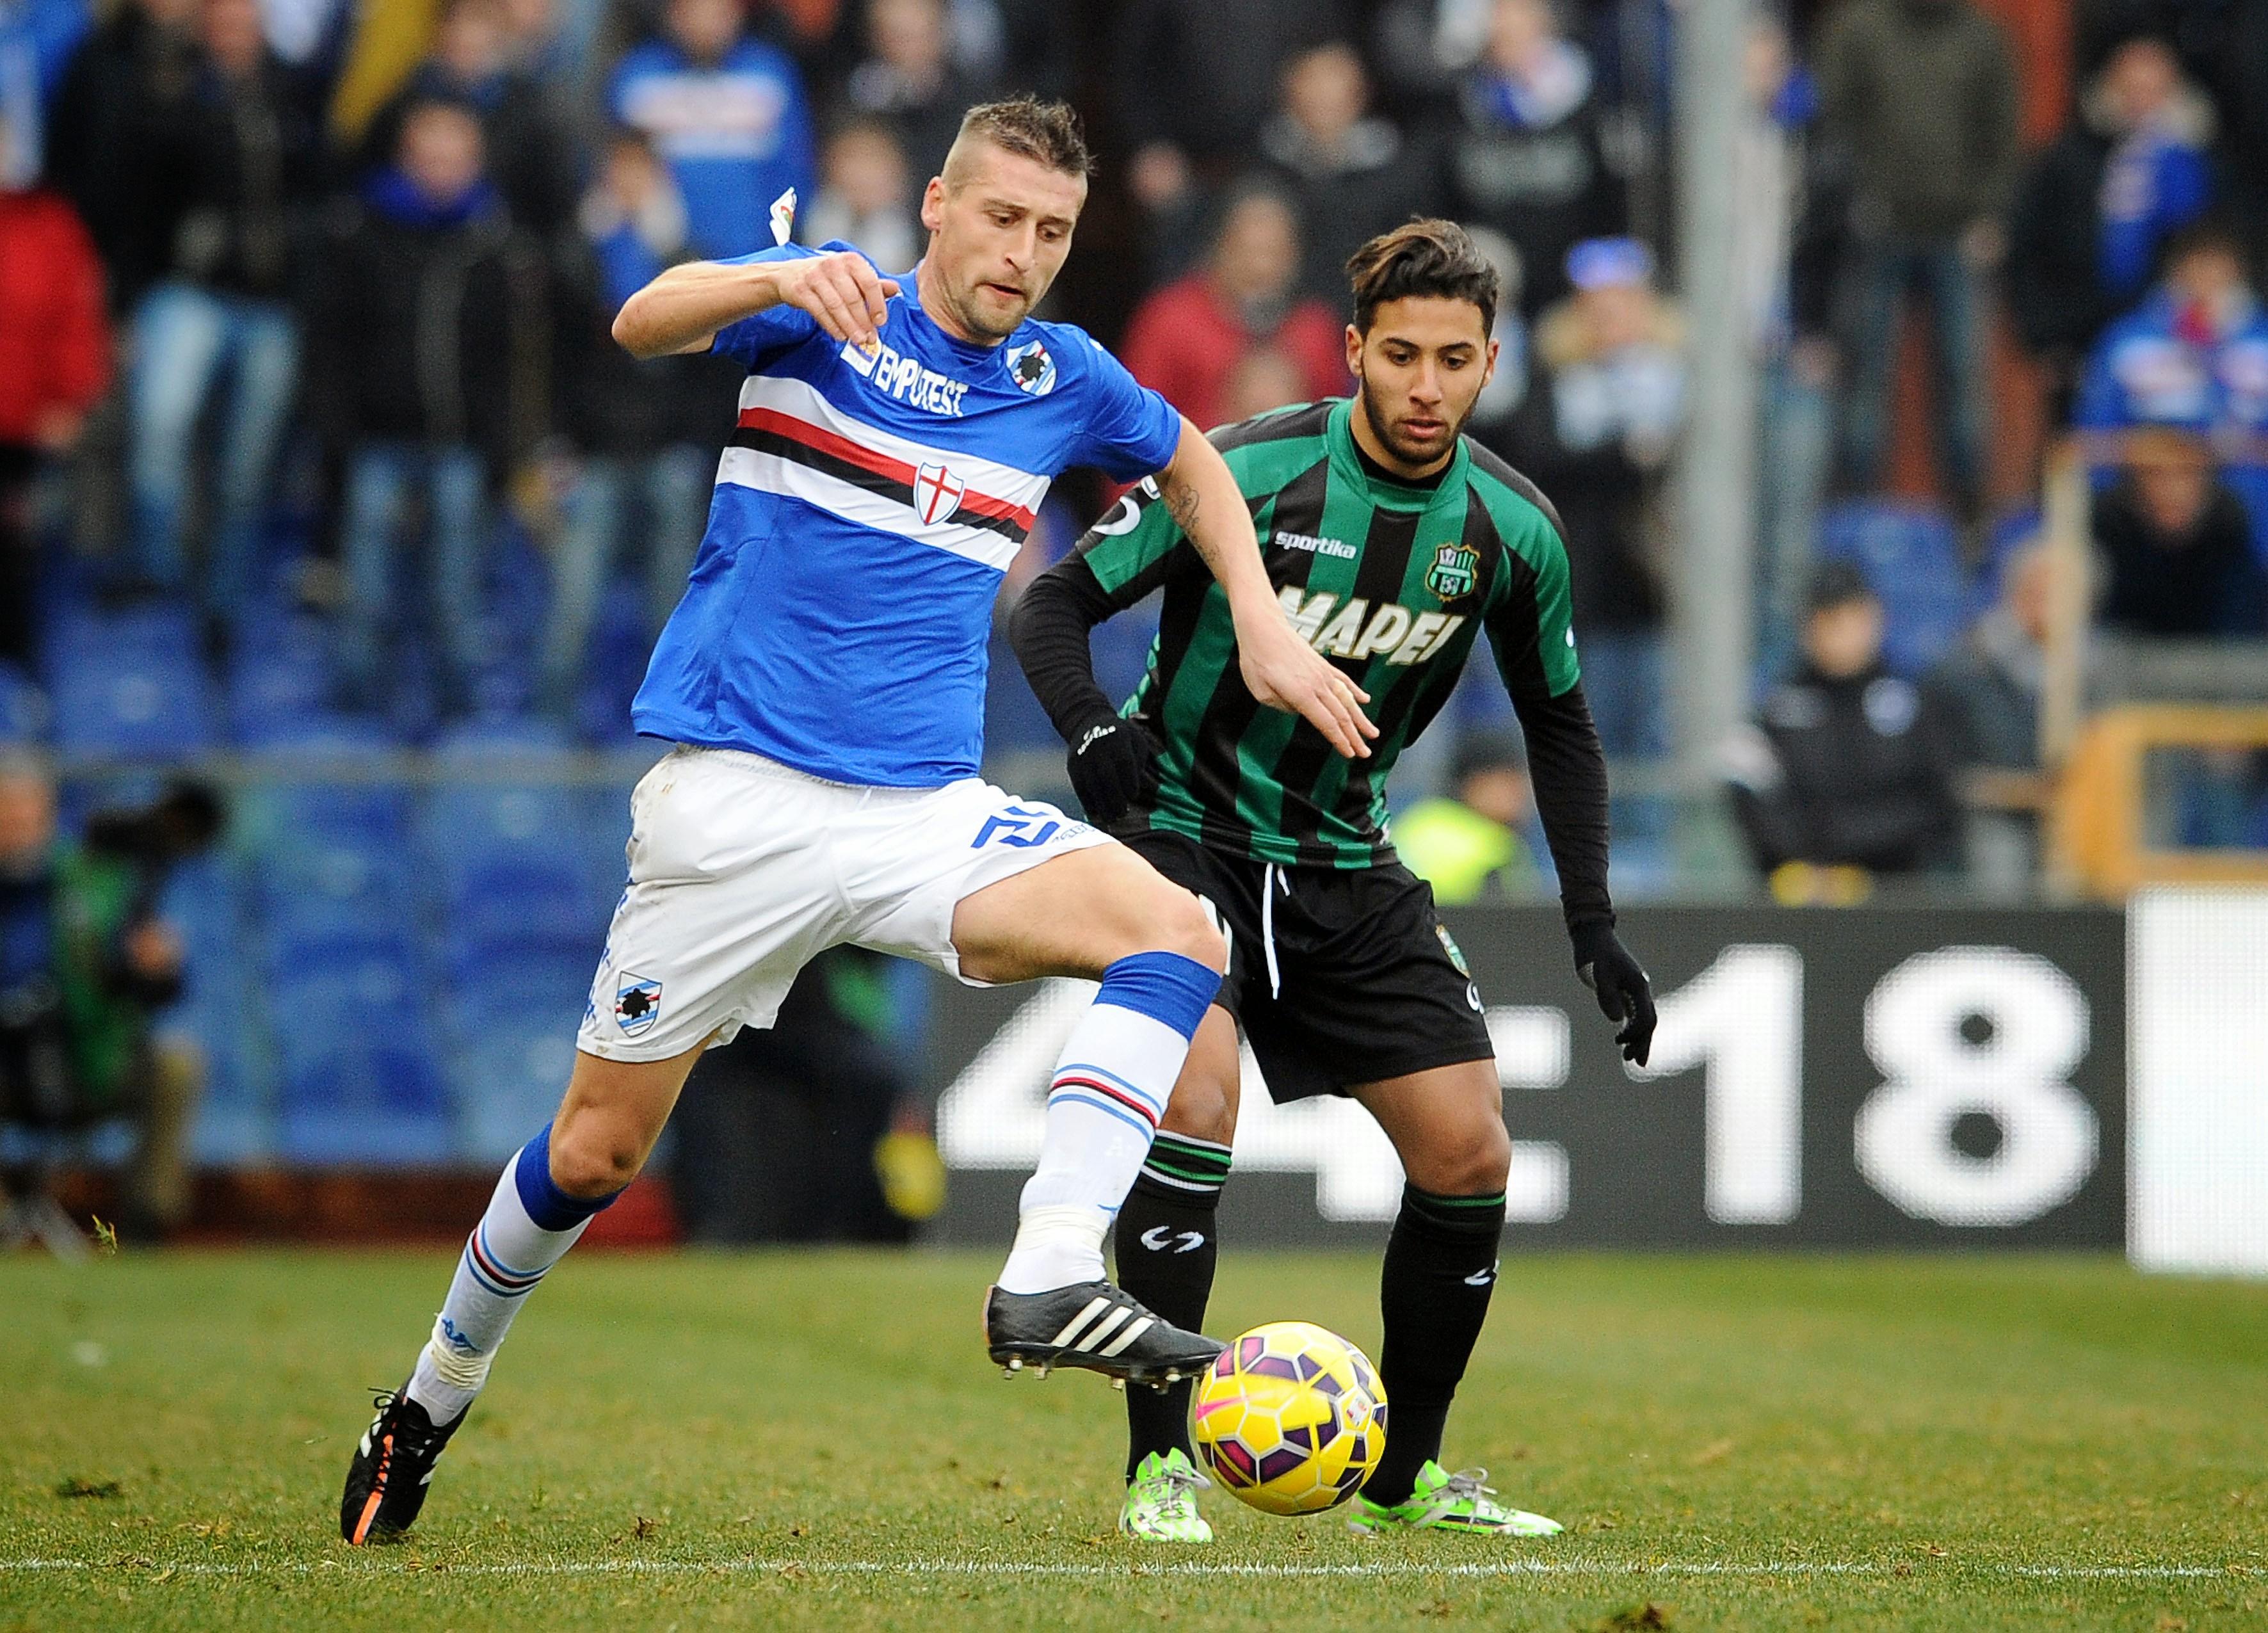 Genova, 08/02/2015Serie A/Sampdoria-SassuoloAndrea Coda-Saphir Taider